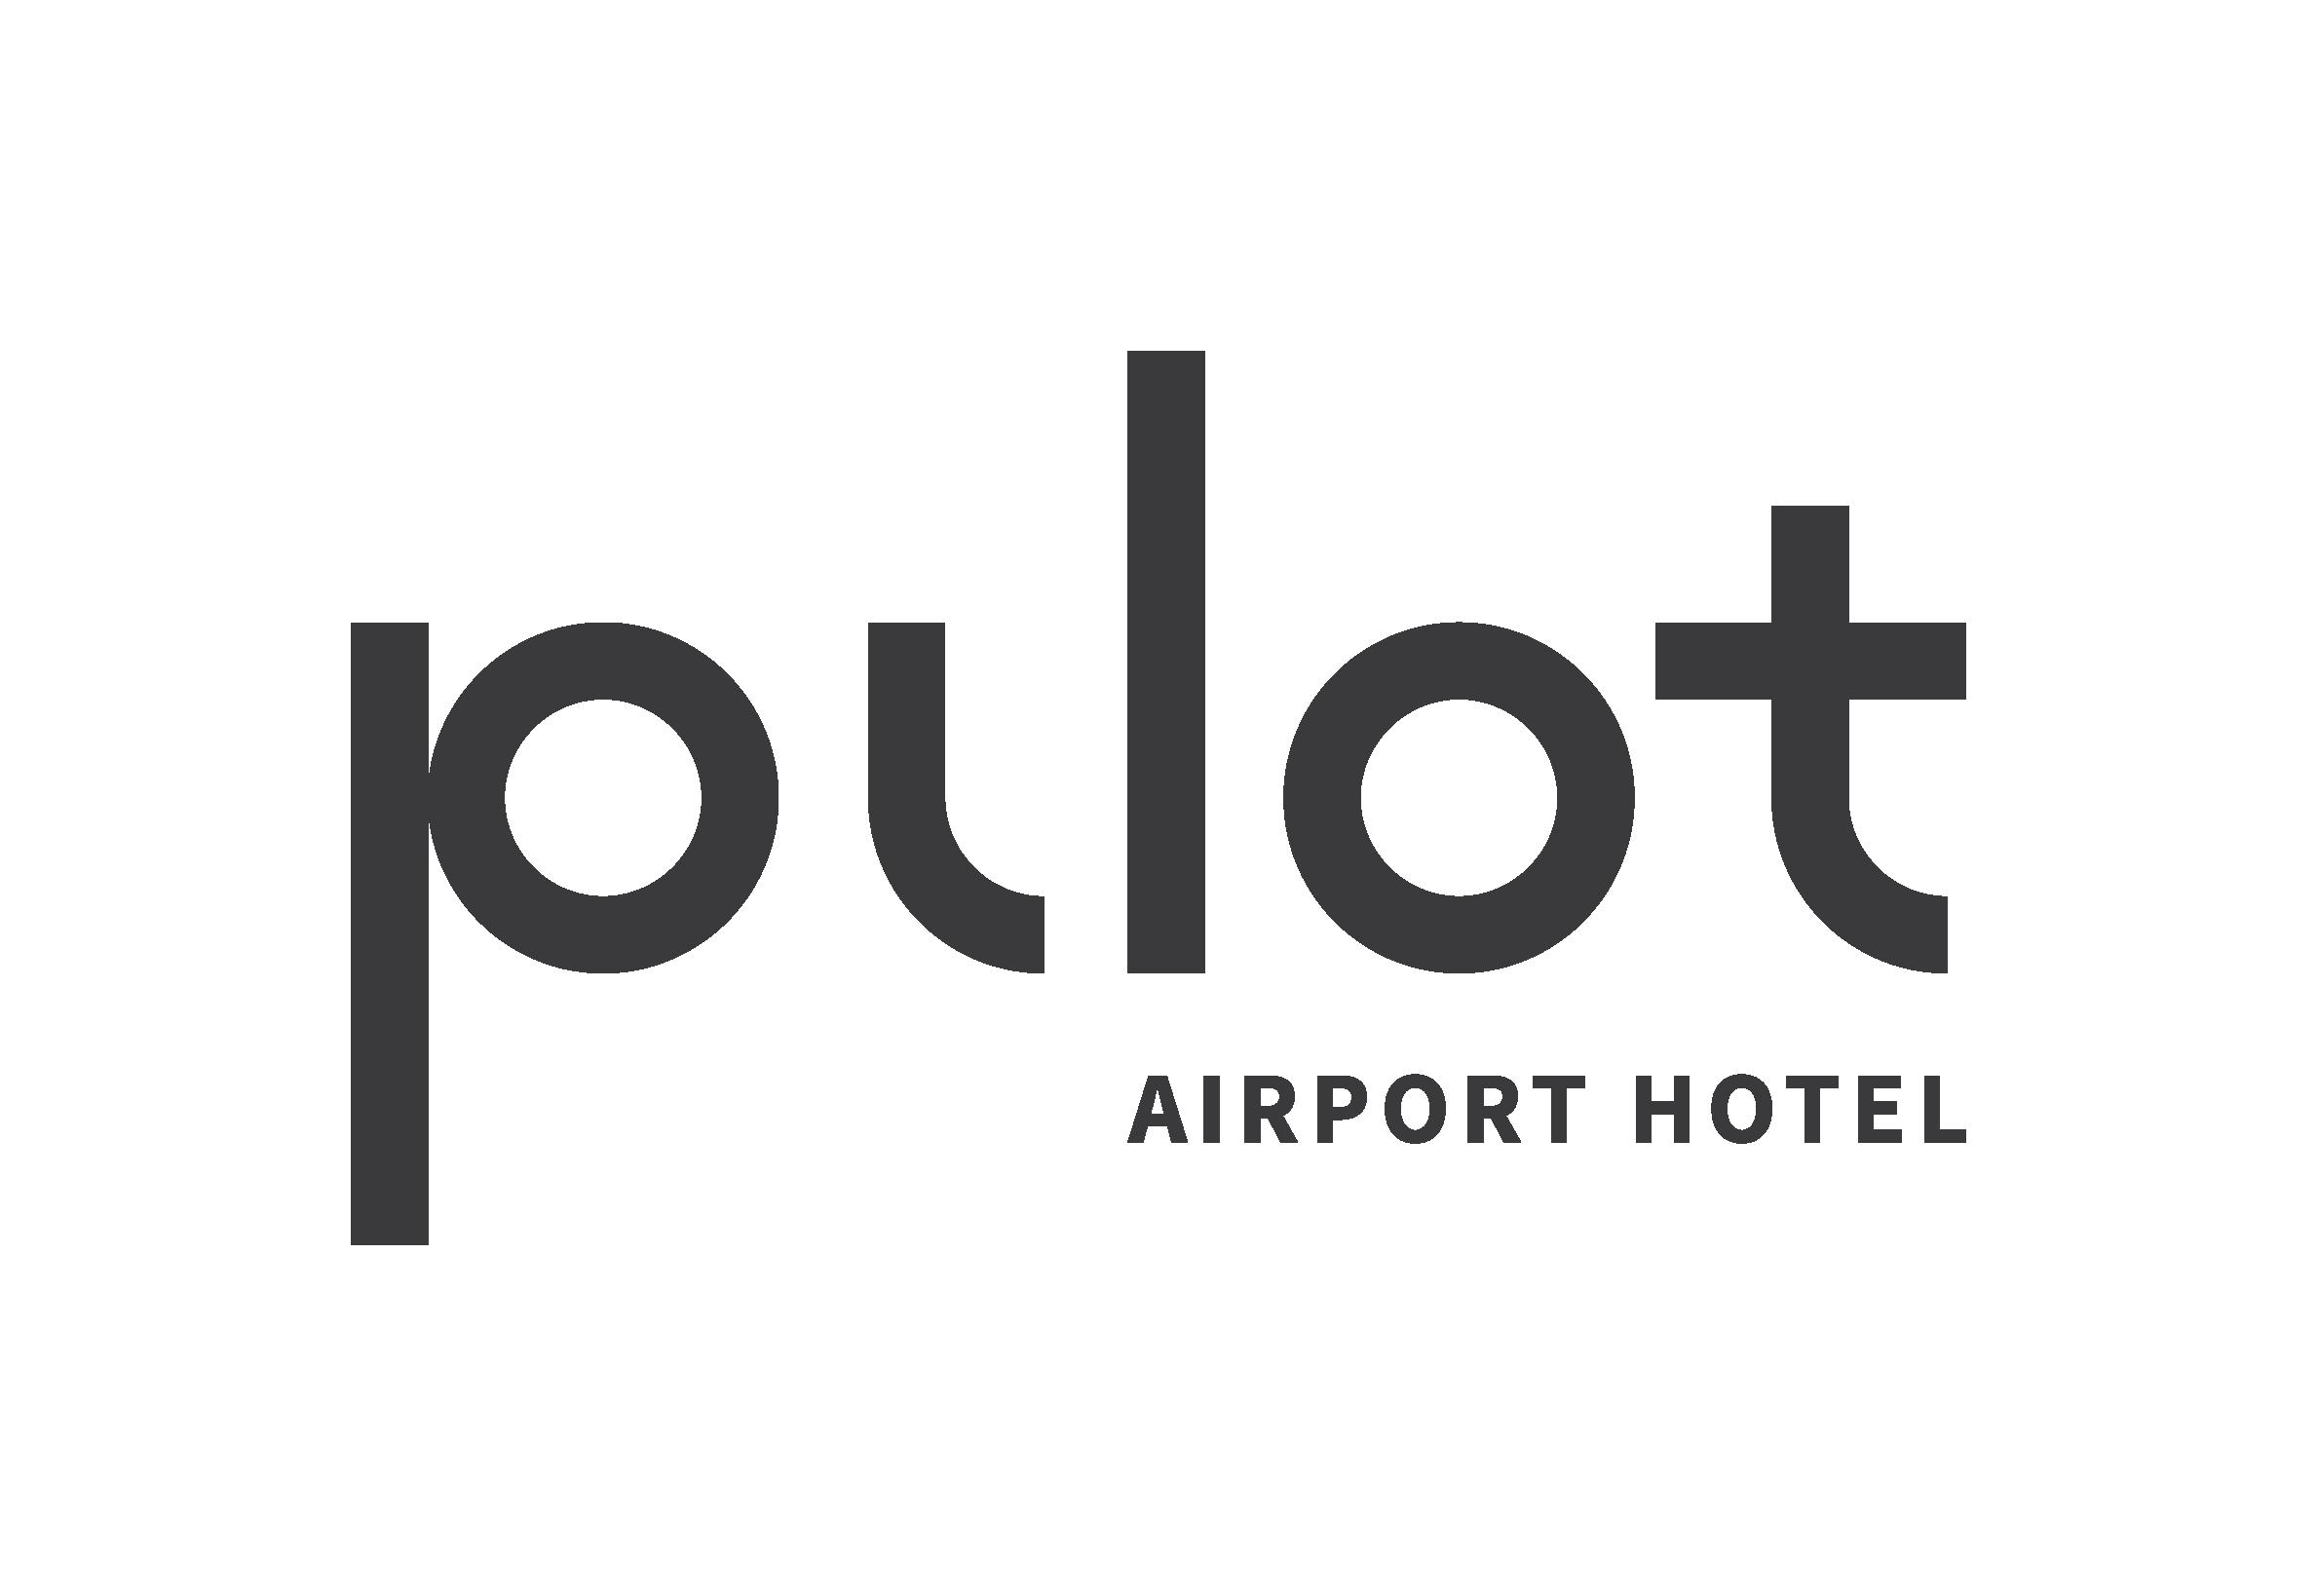 Pilot Airport Hotel